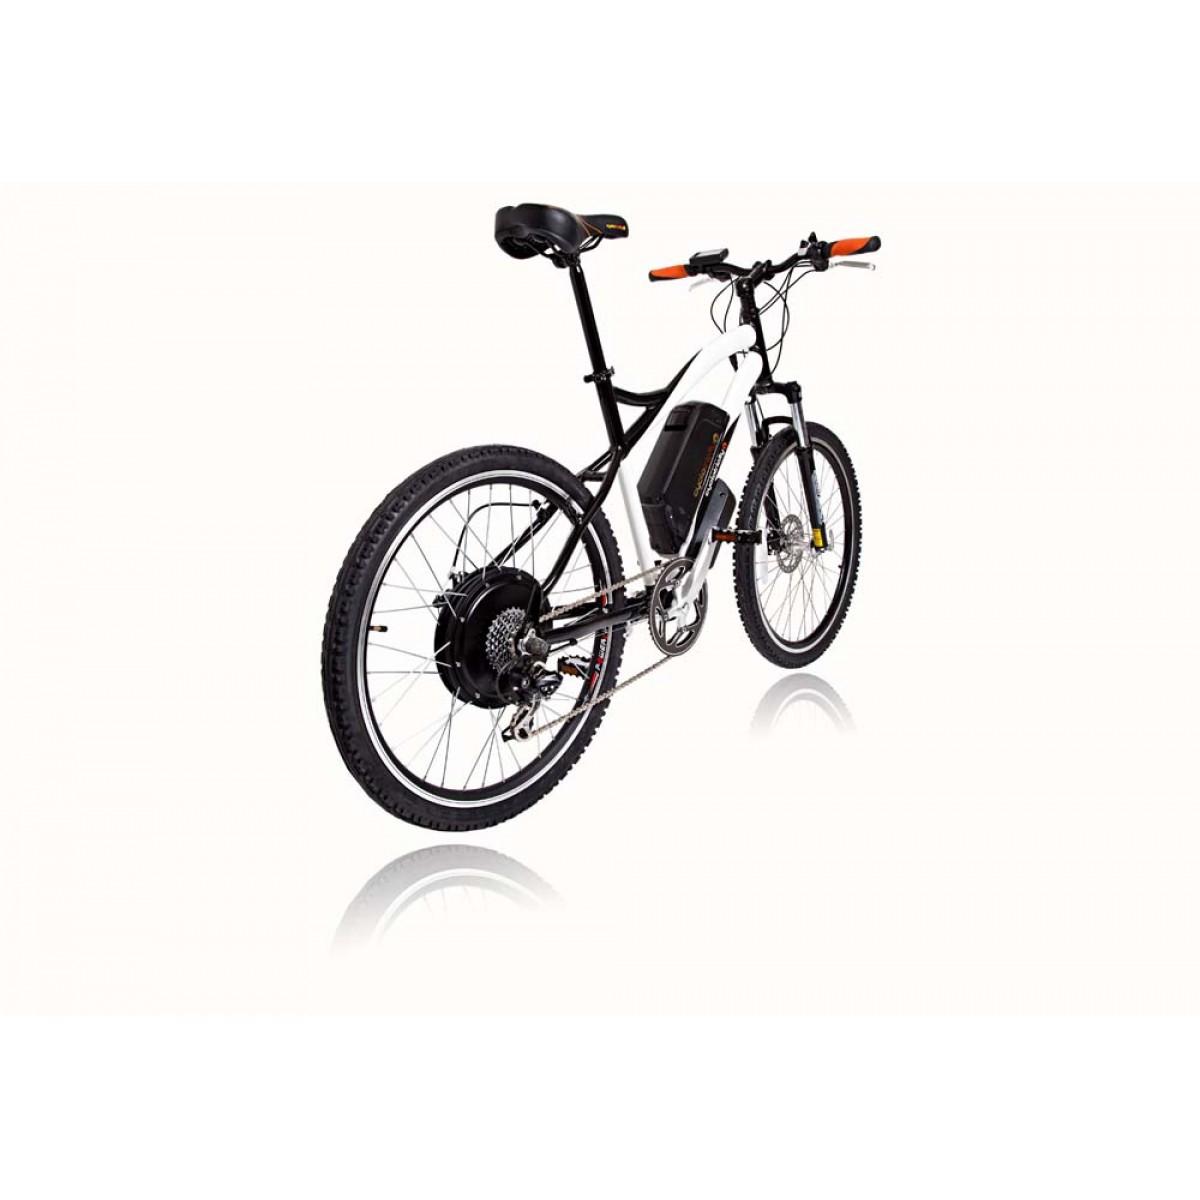 d295ec35362 Cyclotricity Stealth 1000w 12Ah Electric E-Bike